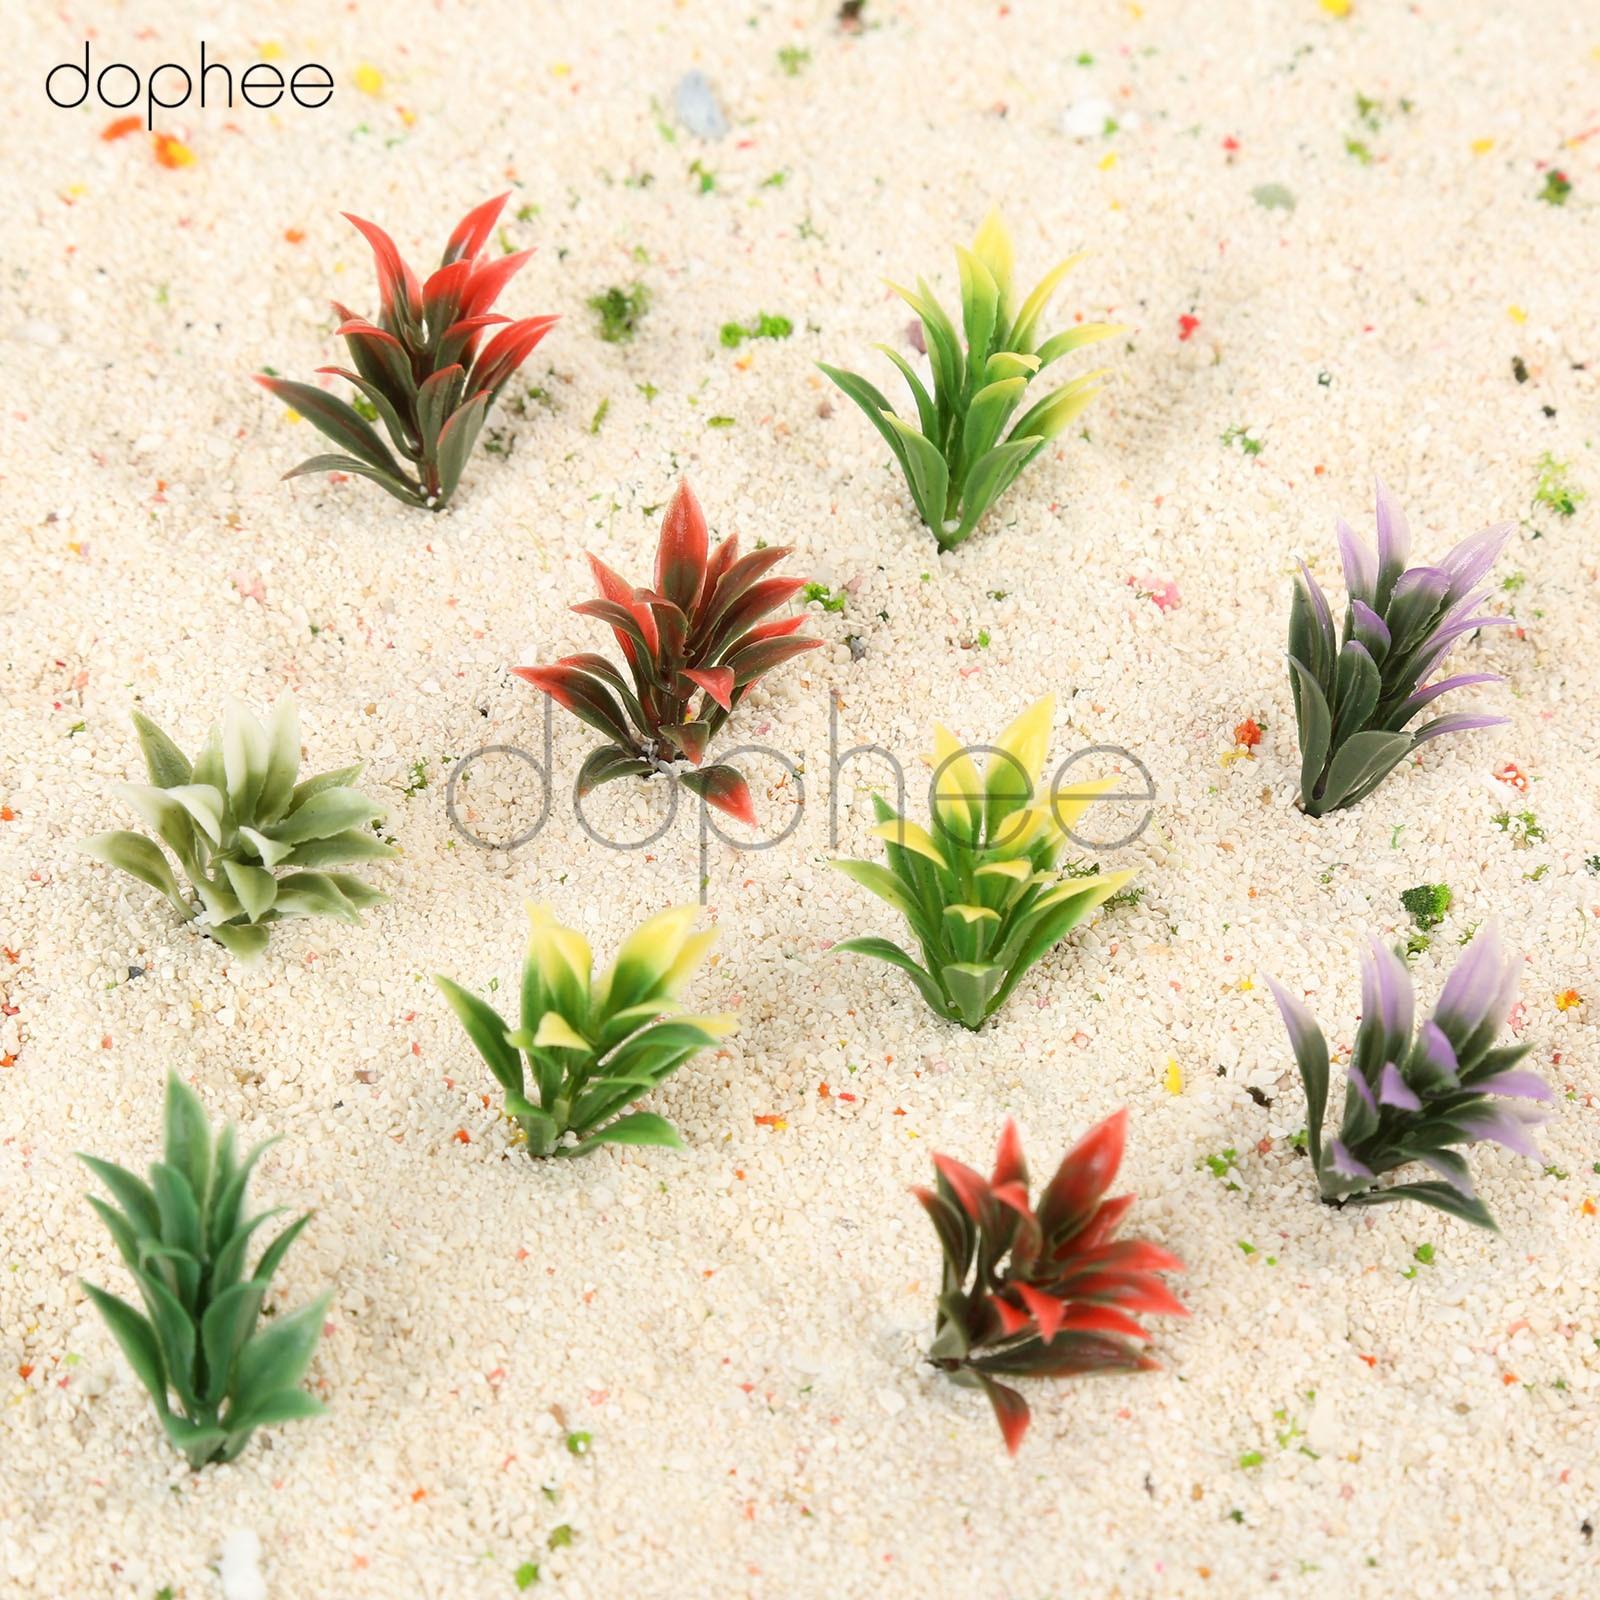 dophee 100pcs Mixed Colors Model Flower Grass Plant Grass 1/100 Model Railway Park Garden Scene Layout